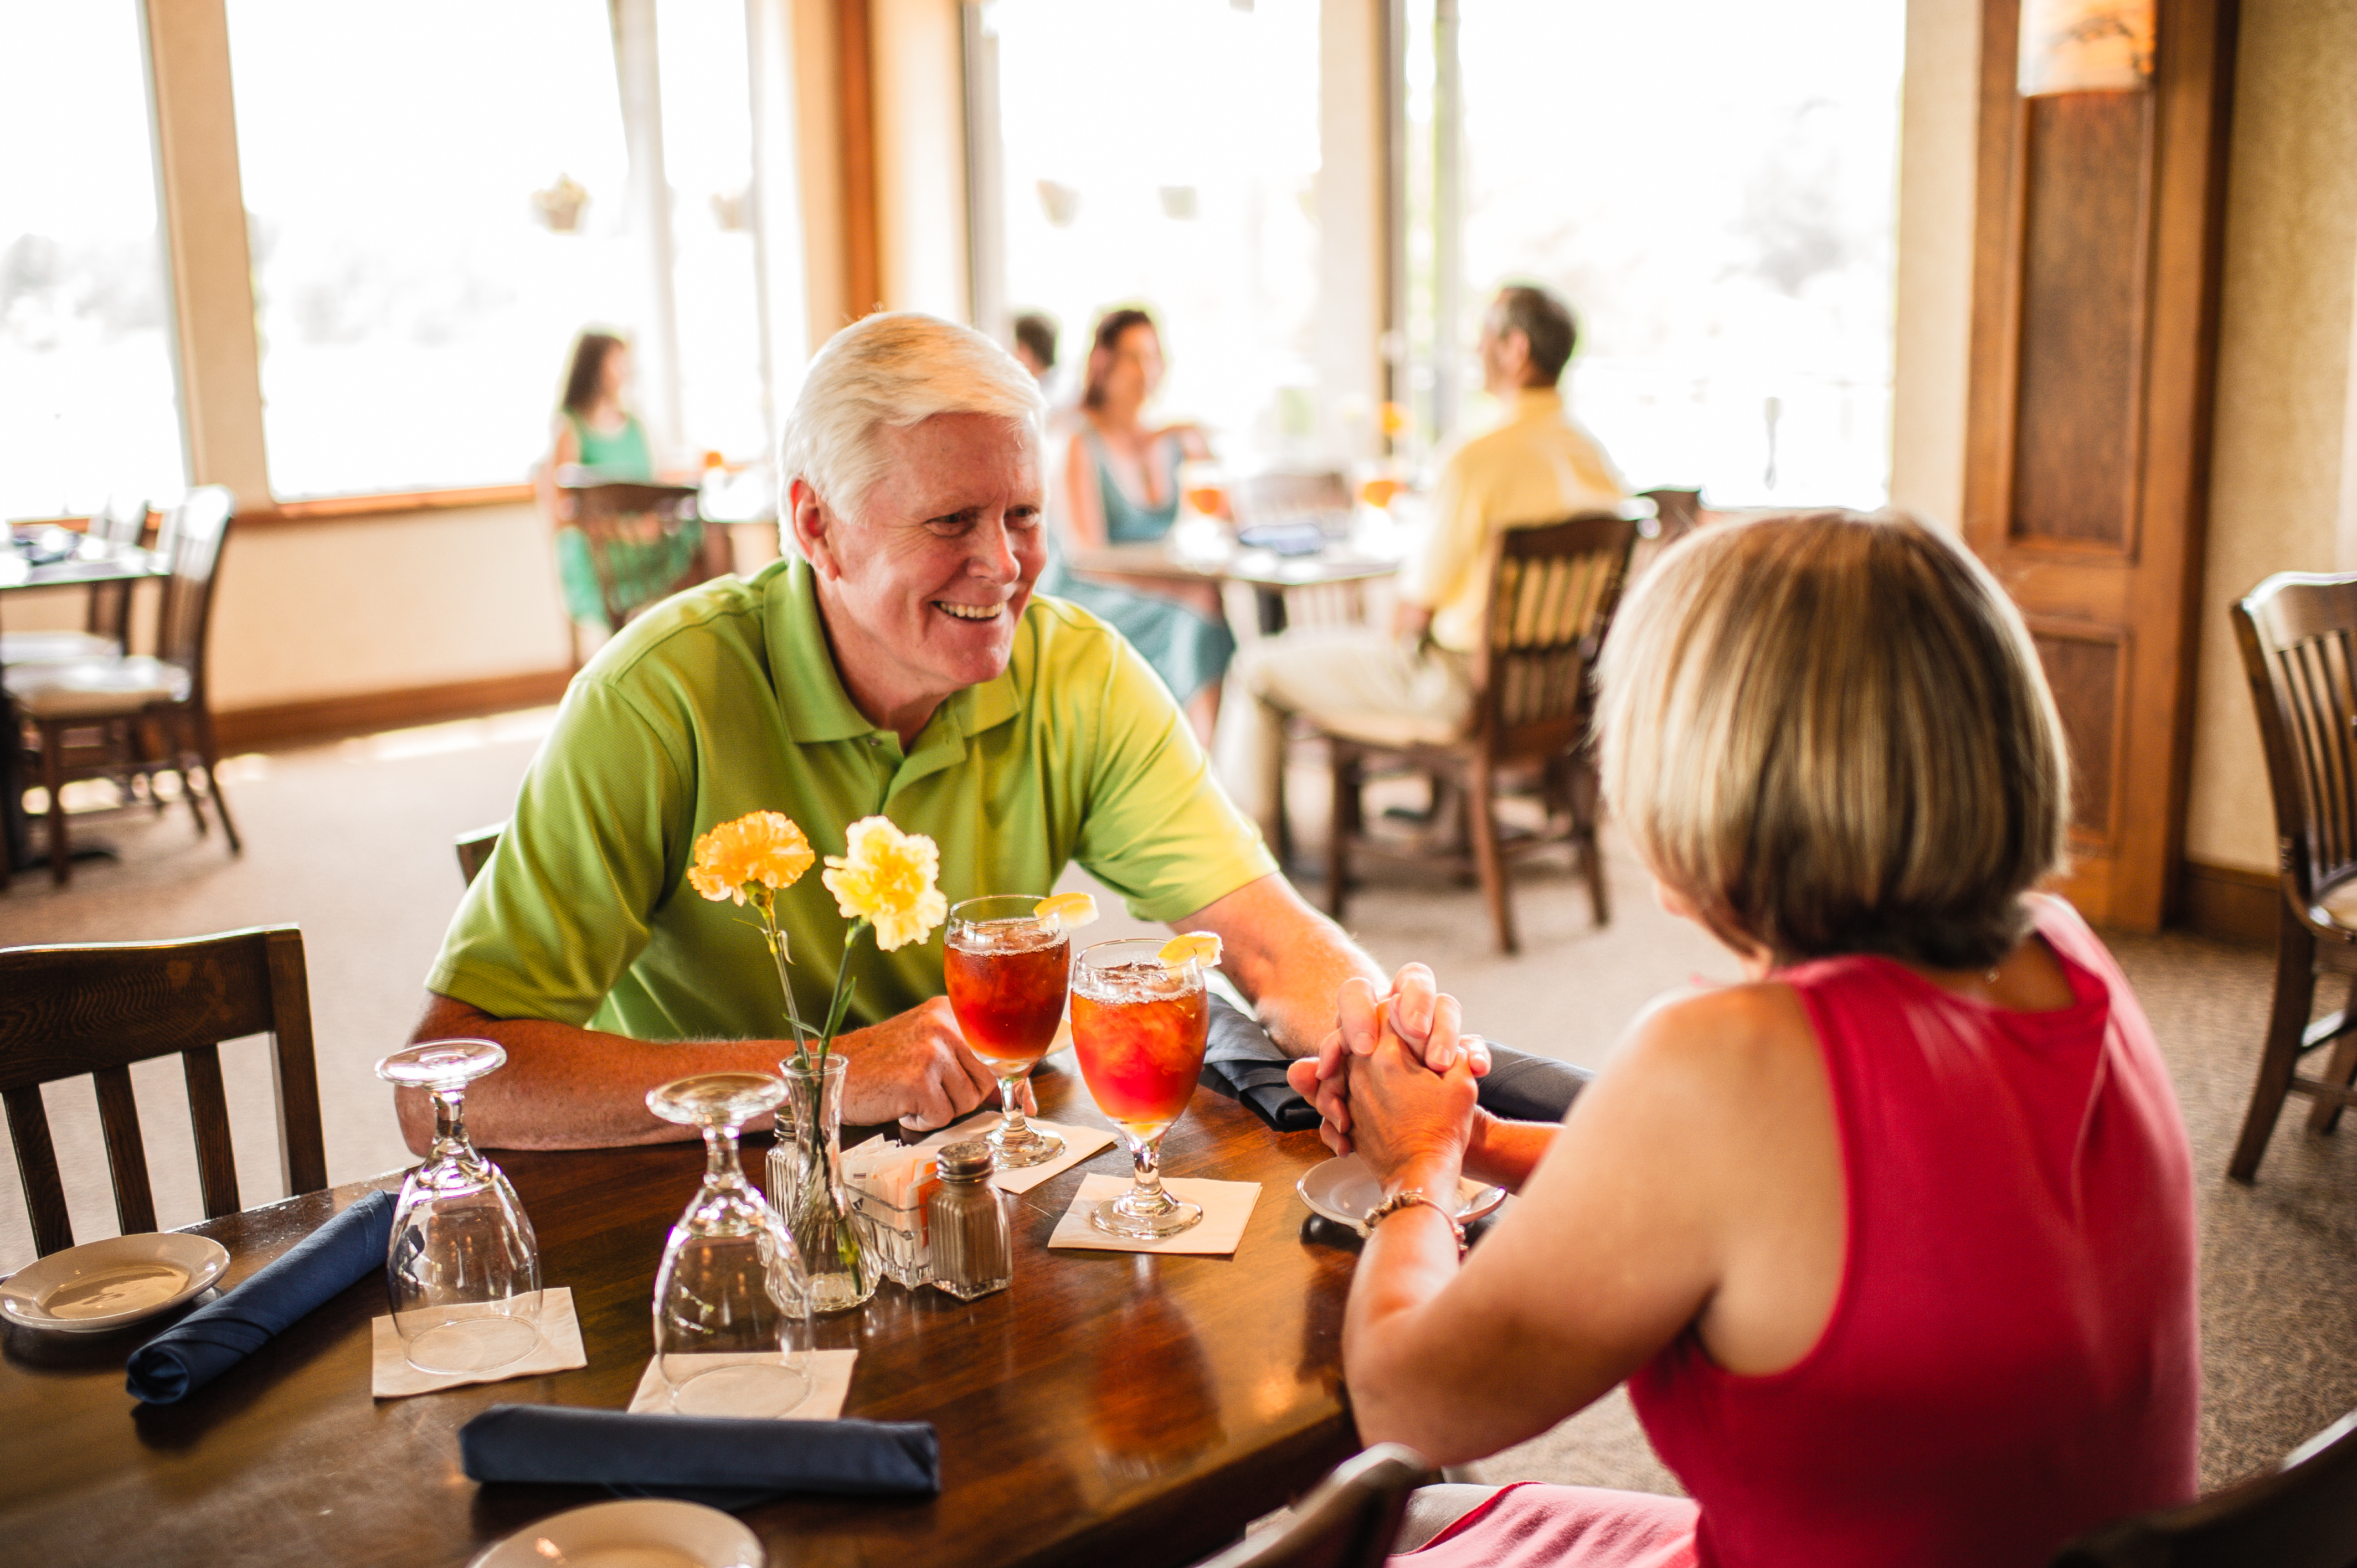 2. A romantic dinner awaits at the Yacht Club